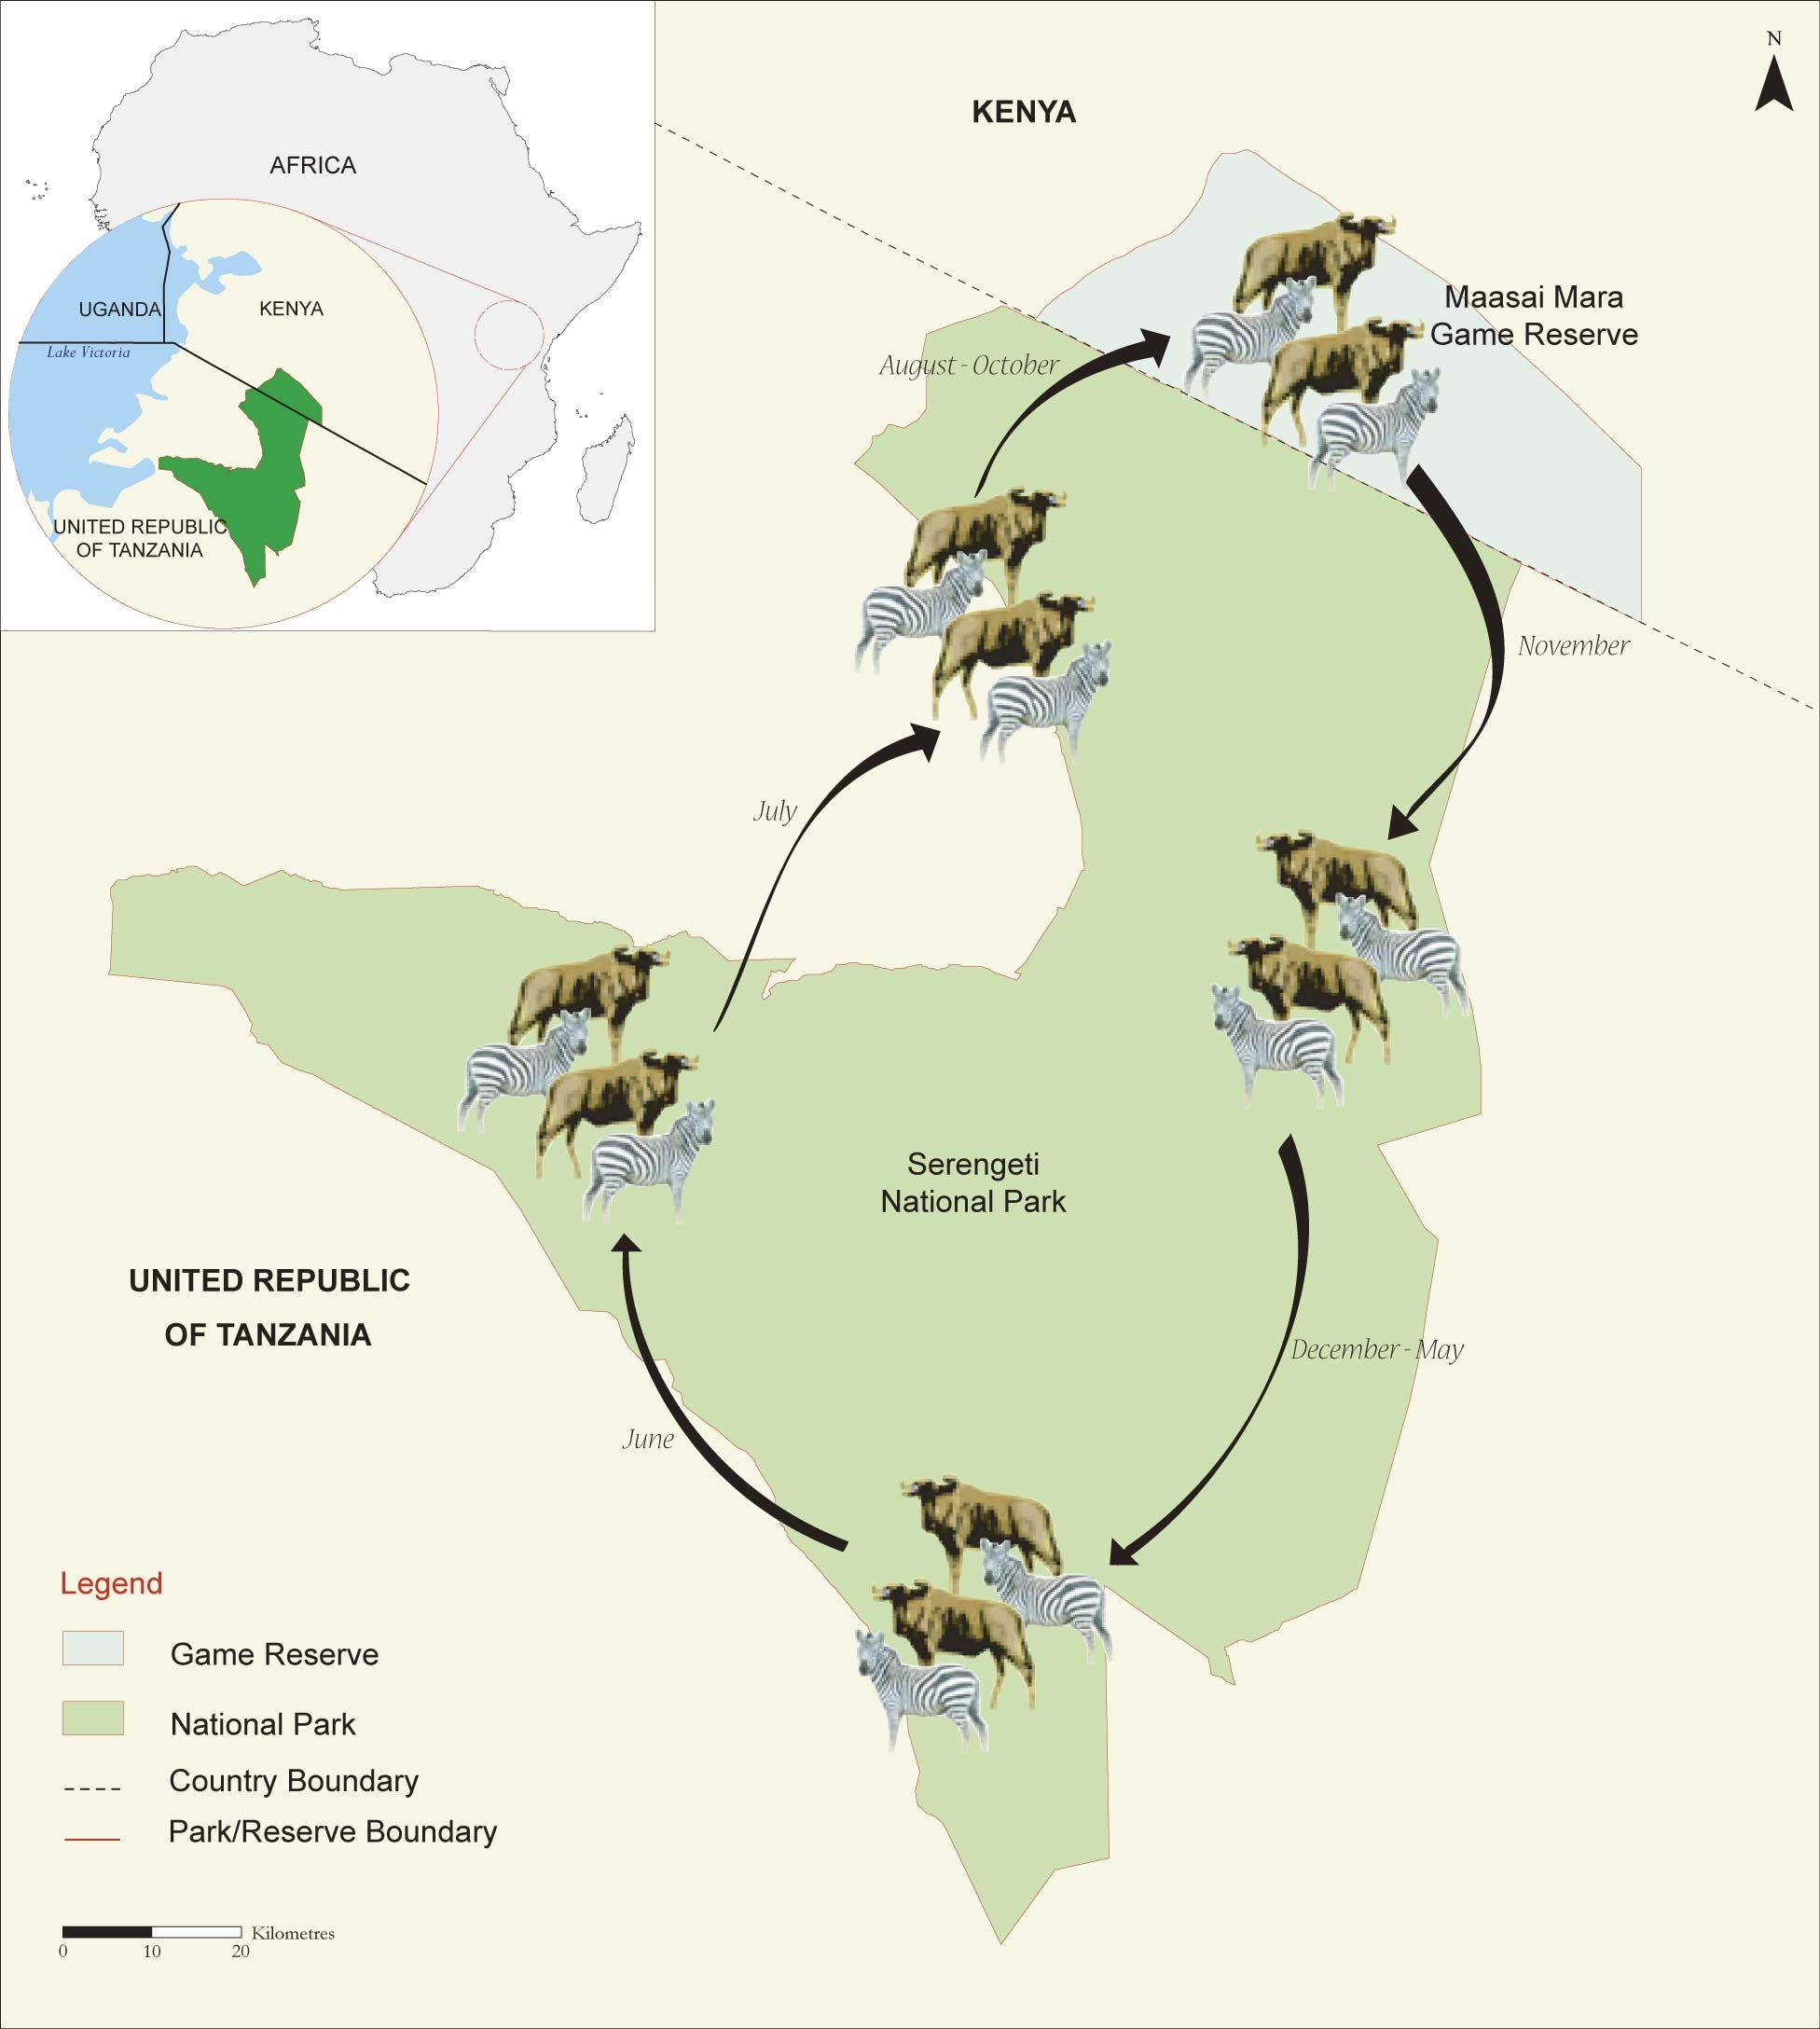 Mara Serengeti Migration Jpg 1952 2176 The Great Migration